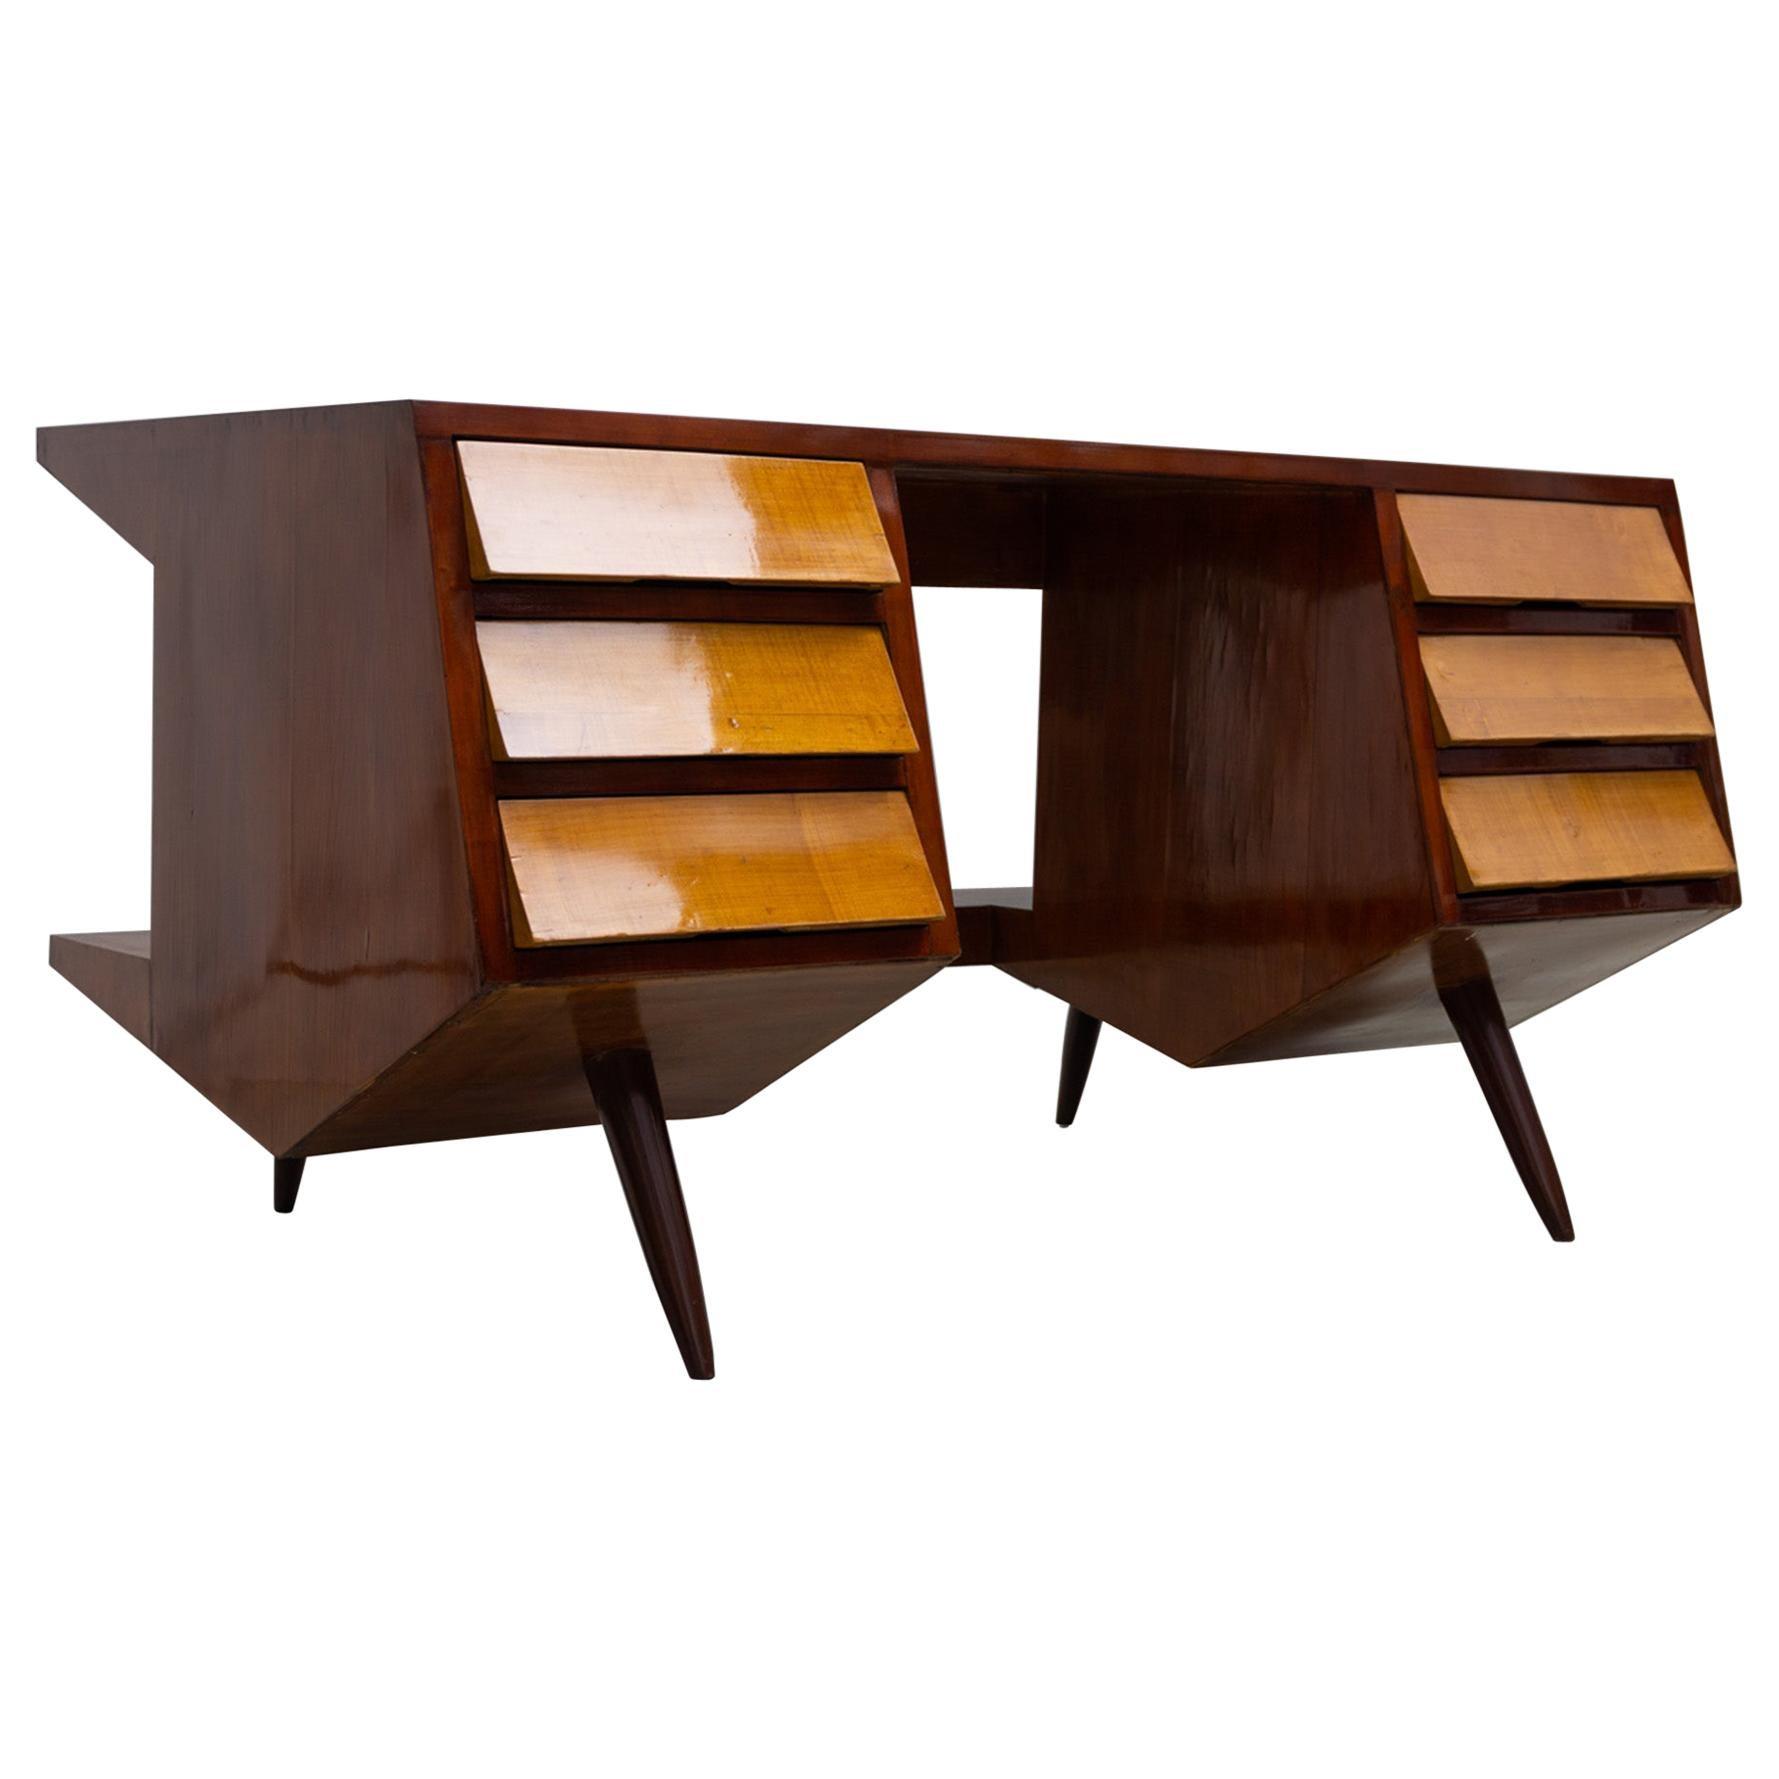 Maple and Walnut Desk with Drawers by Luigi Claudio Olivieri, 1950